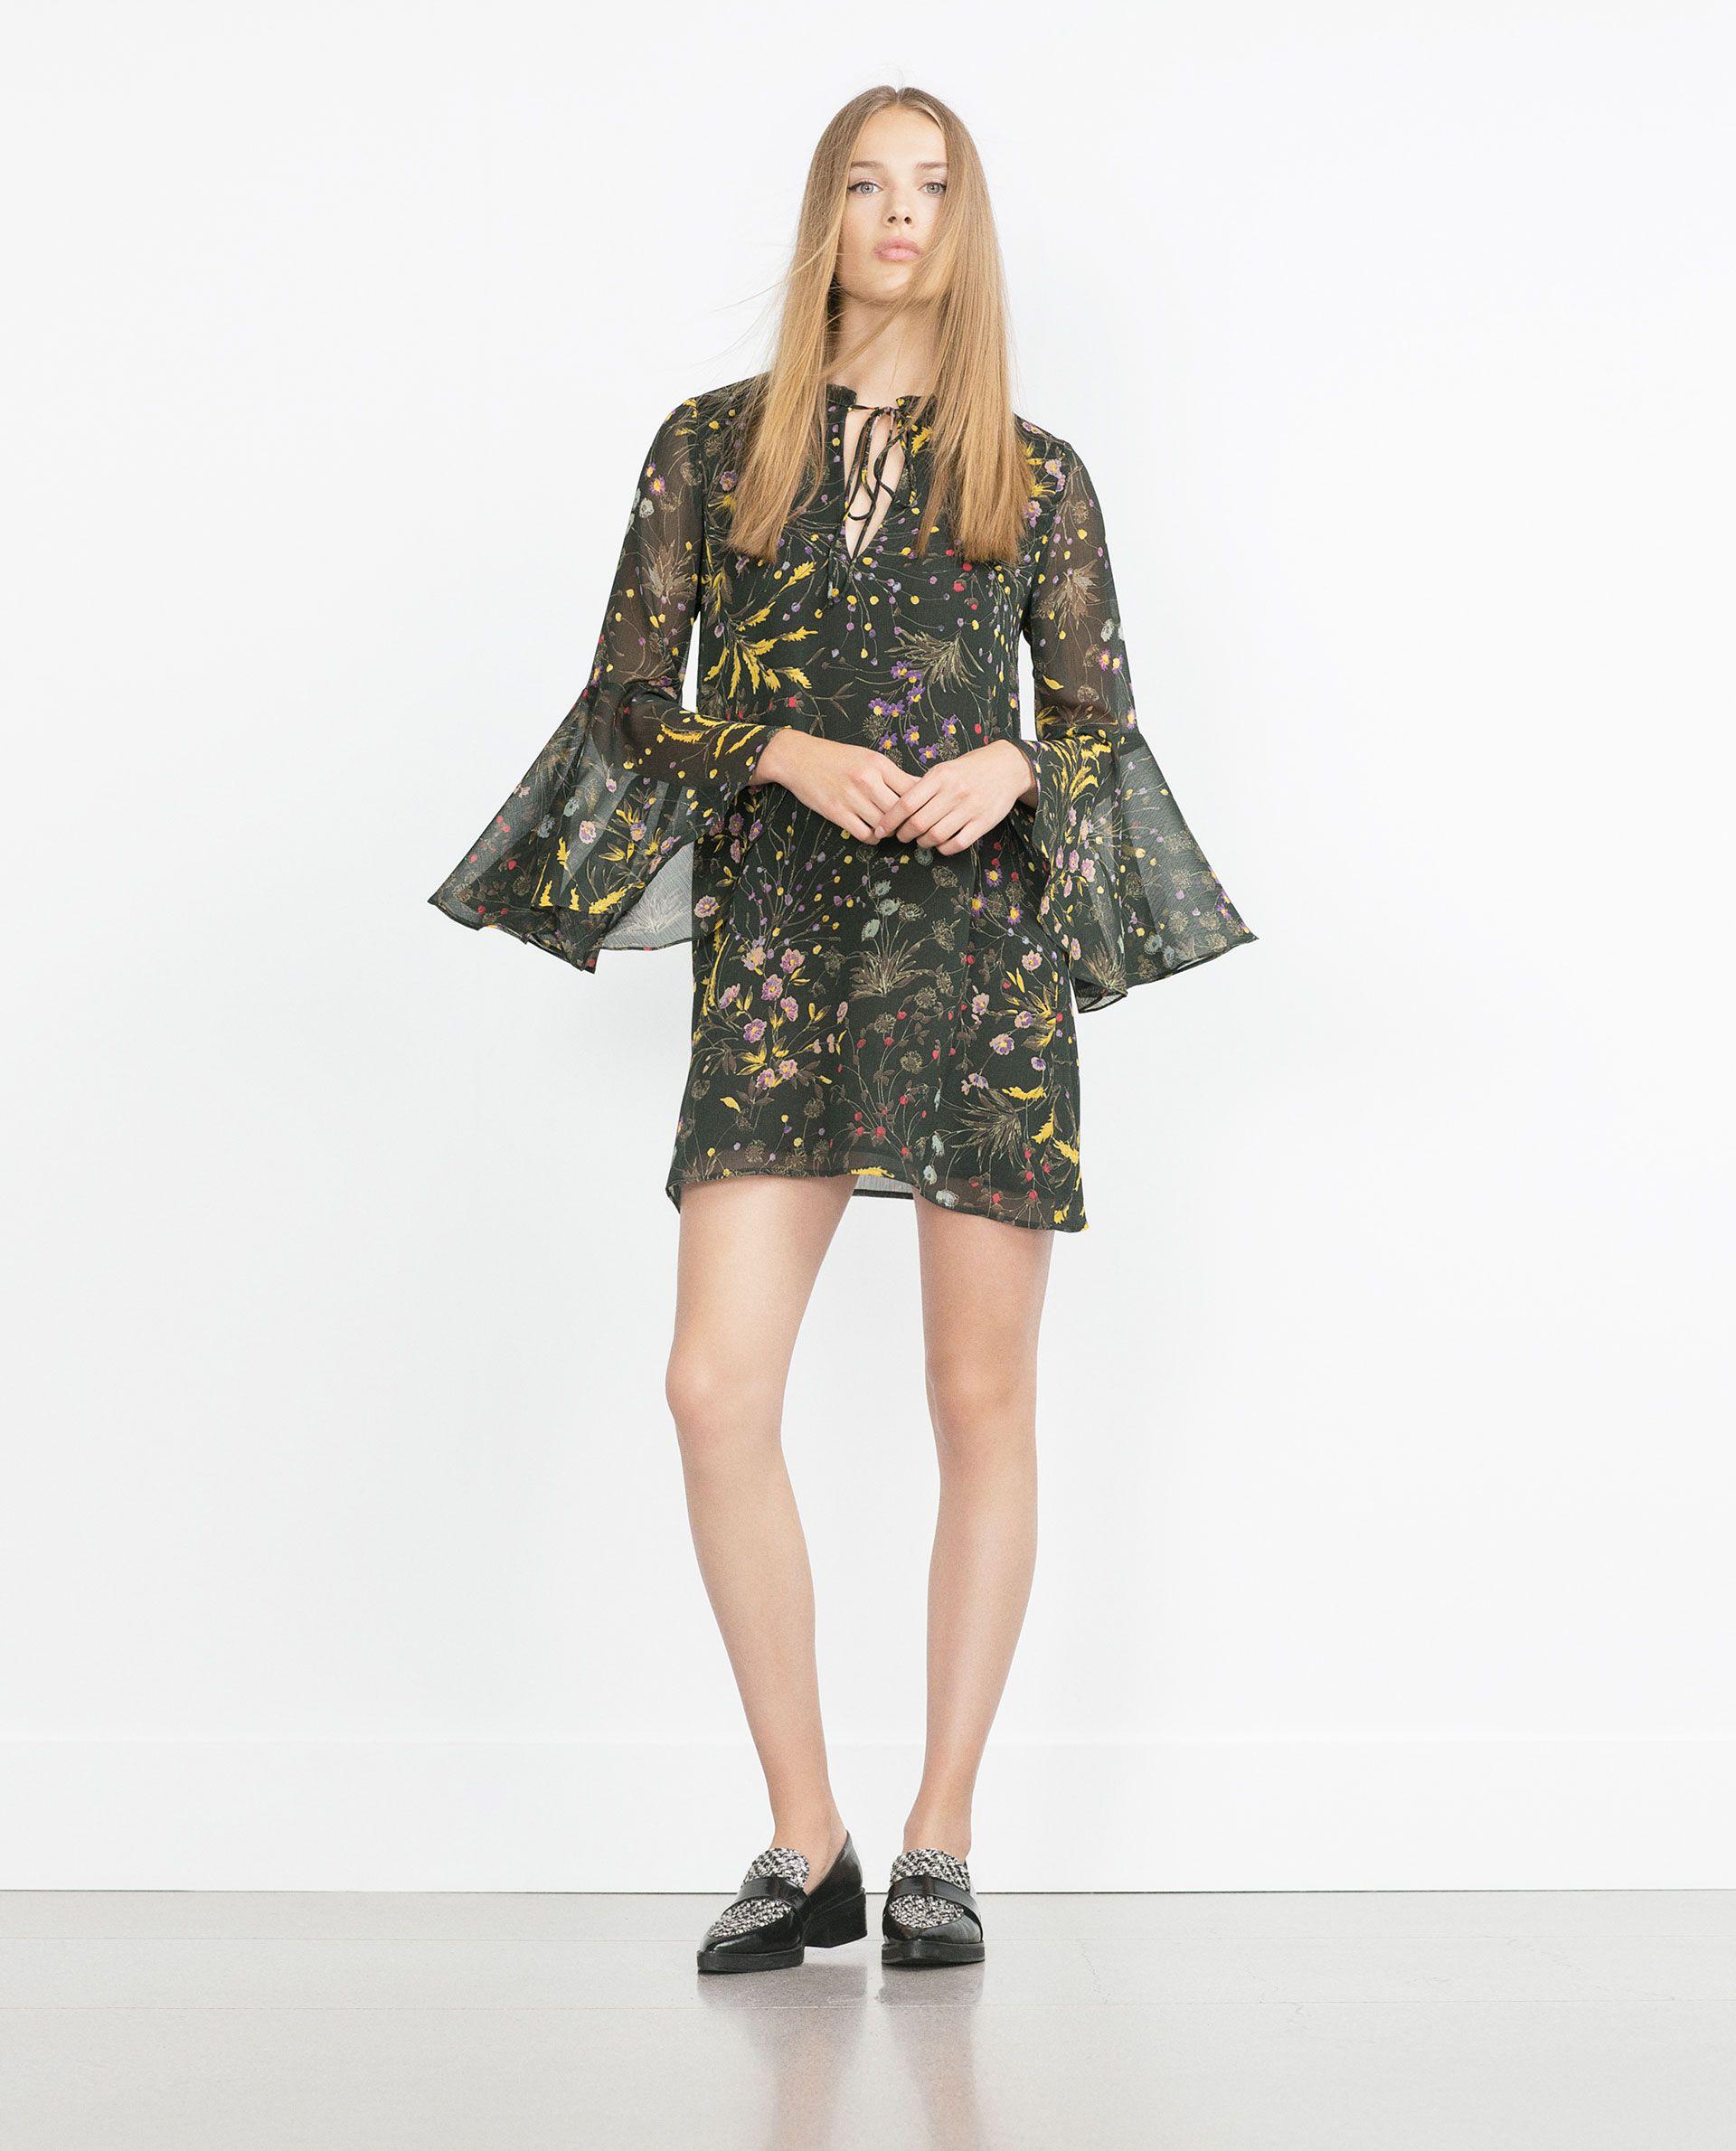 FLORAL PRINT DRESS - Collection - Woman - NEW IN | ZARA Ukraine